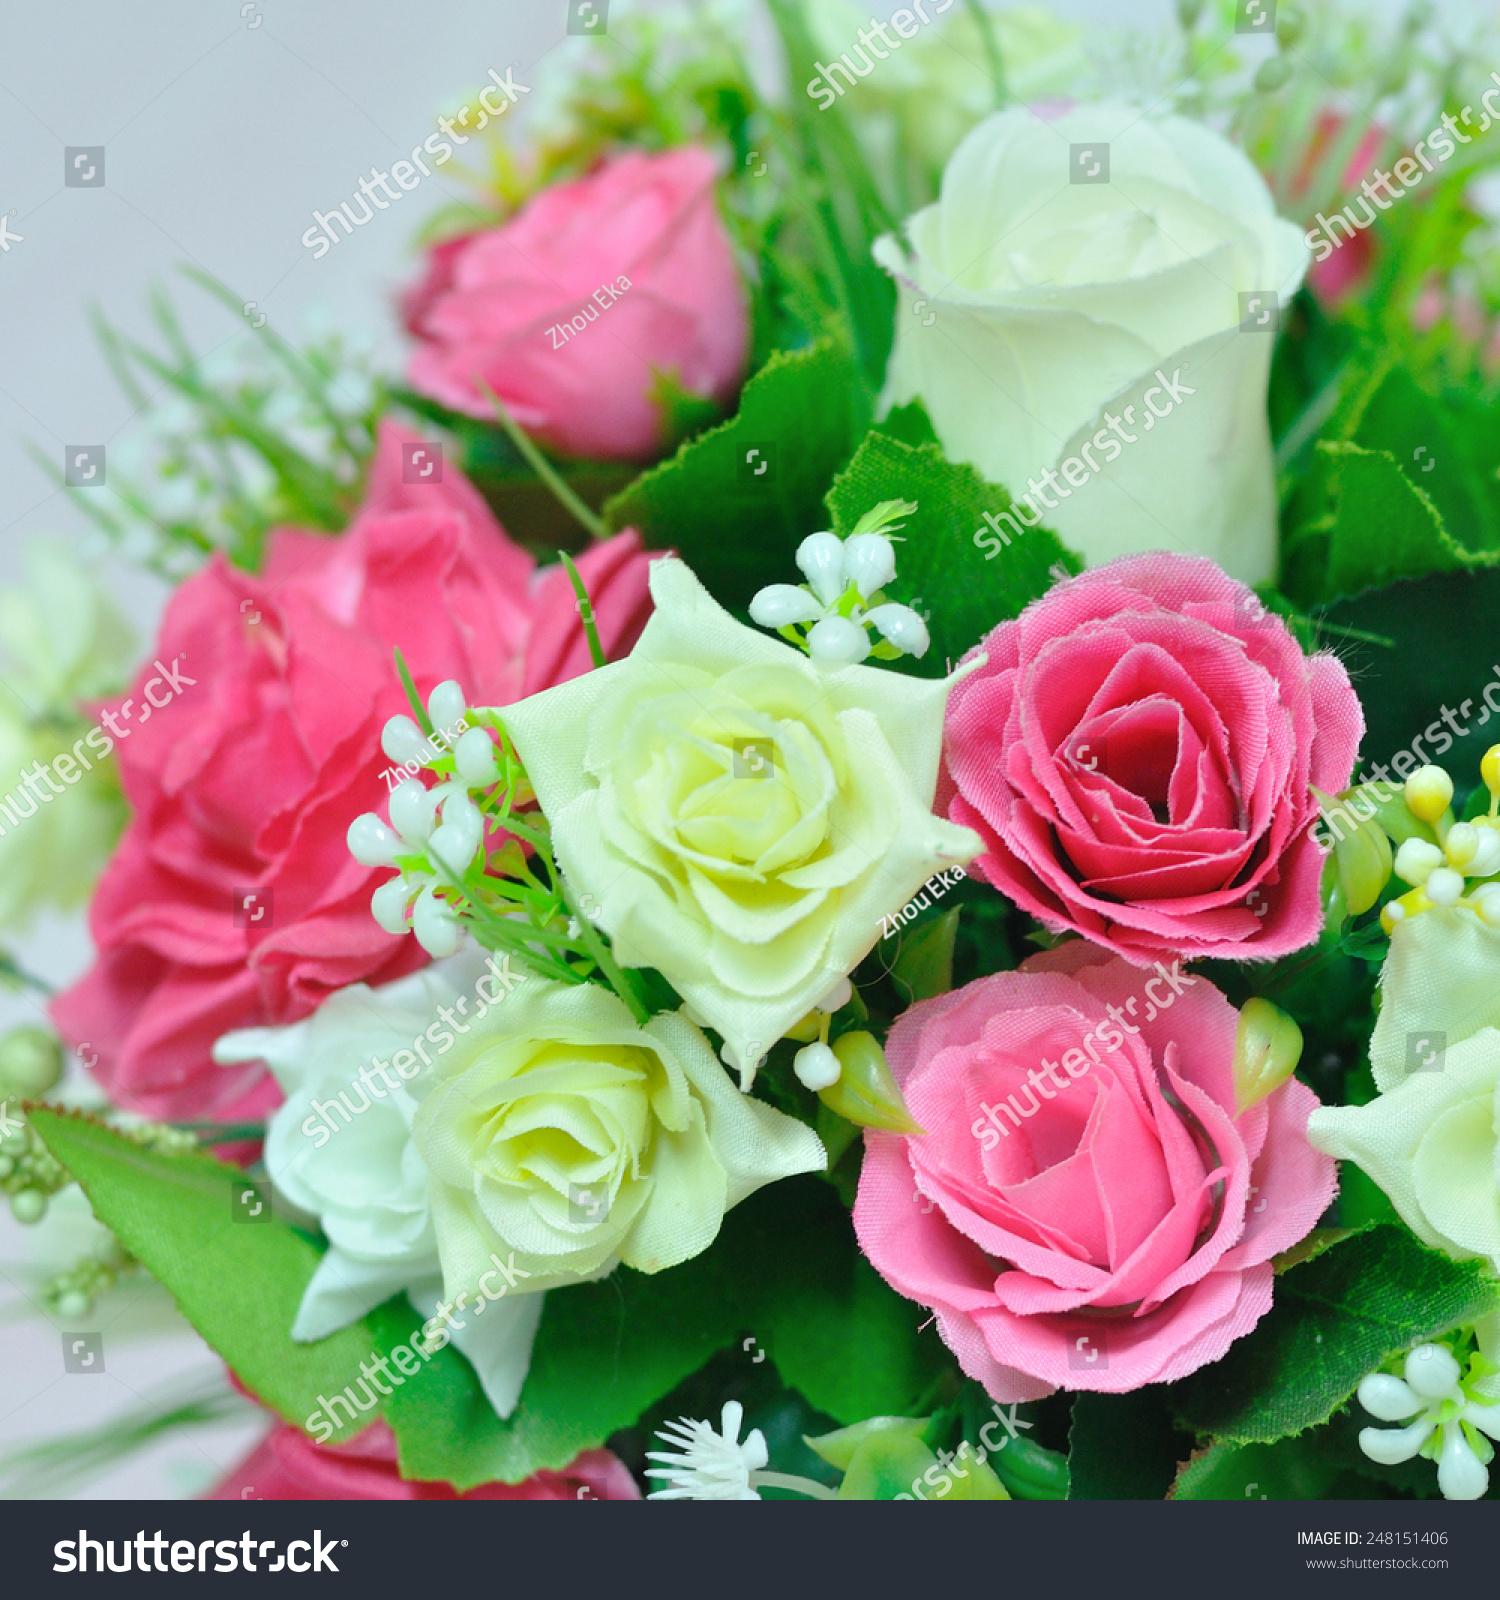 Beautiful flowers basket on table stock photo royalty free beautiful flowers in basket on table izmirmasajfo